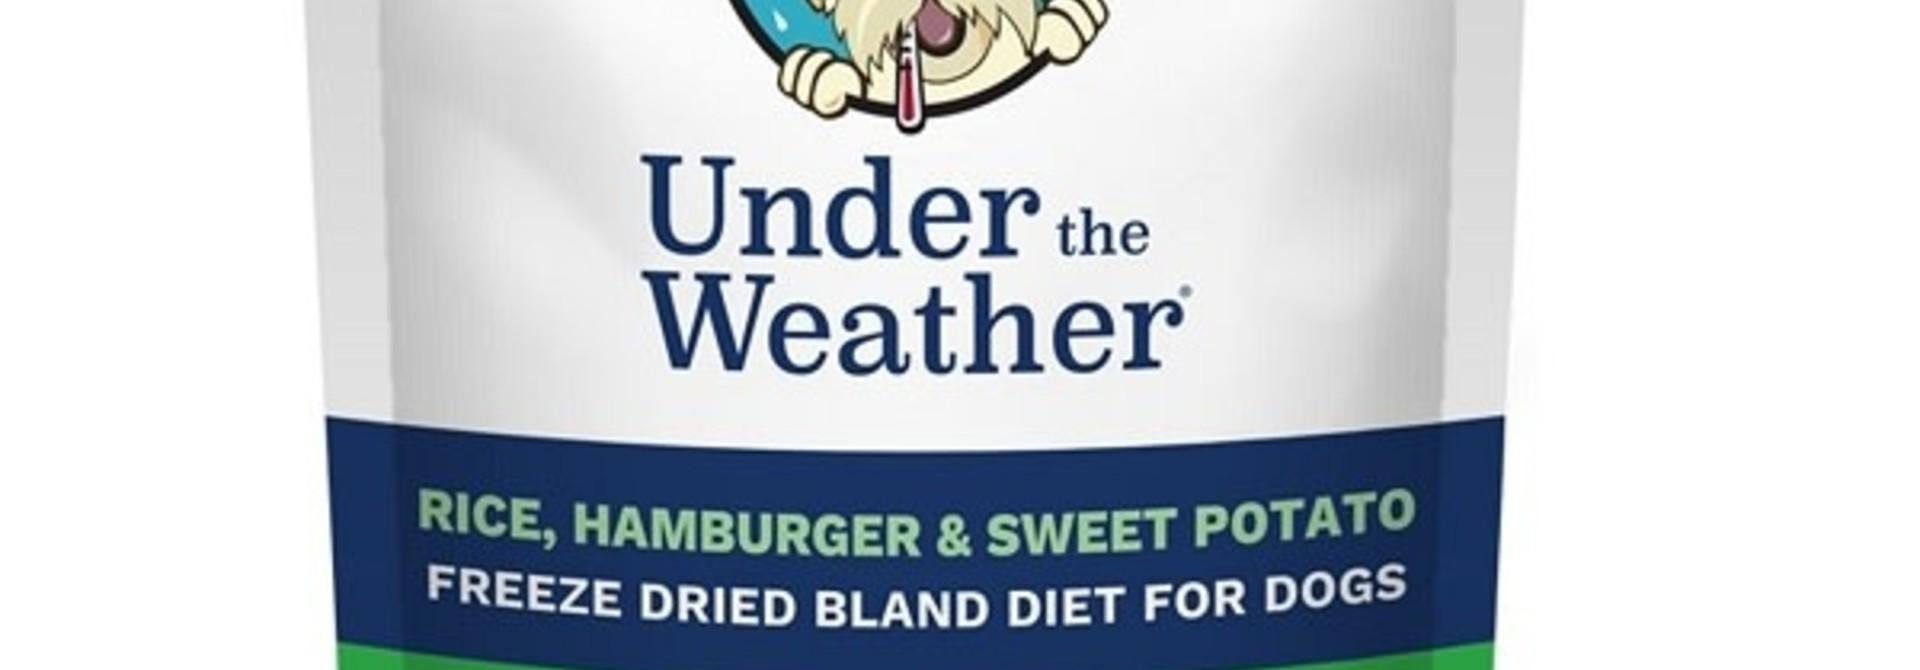 Bland Diets Hamburger, Rice, Swt Pot w/Electrolytes - 6oz